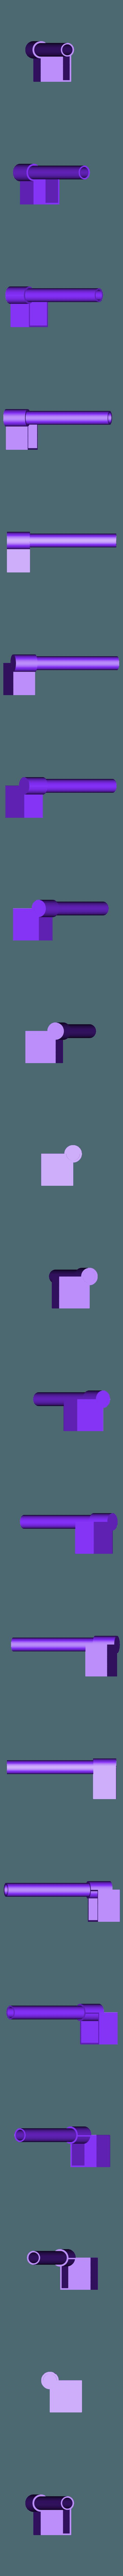 Pencil Tree_ Base.stl Download free STL file Pencil Tree • 3D print object, Terryyy